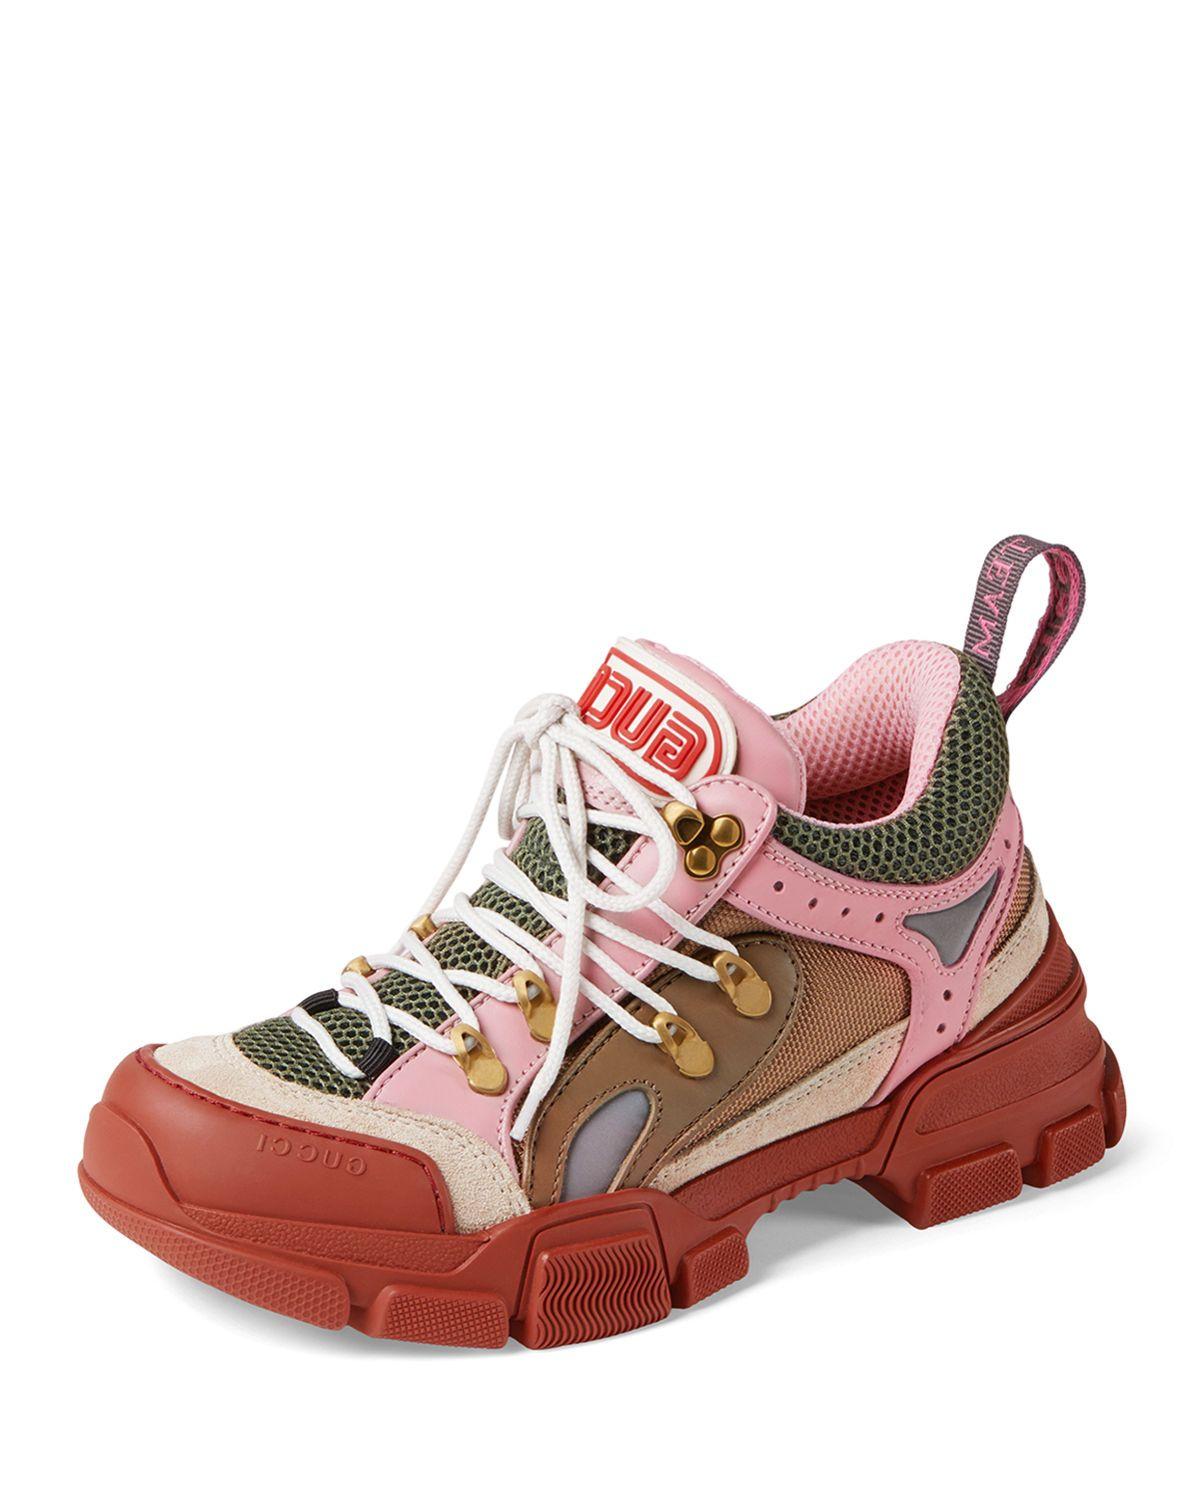 7bb653aed57 Gucci Flashtrek Hiker Sneaker in 2019